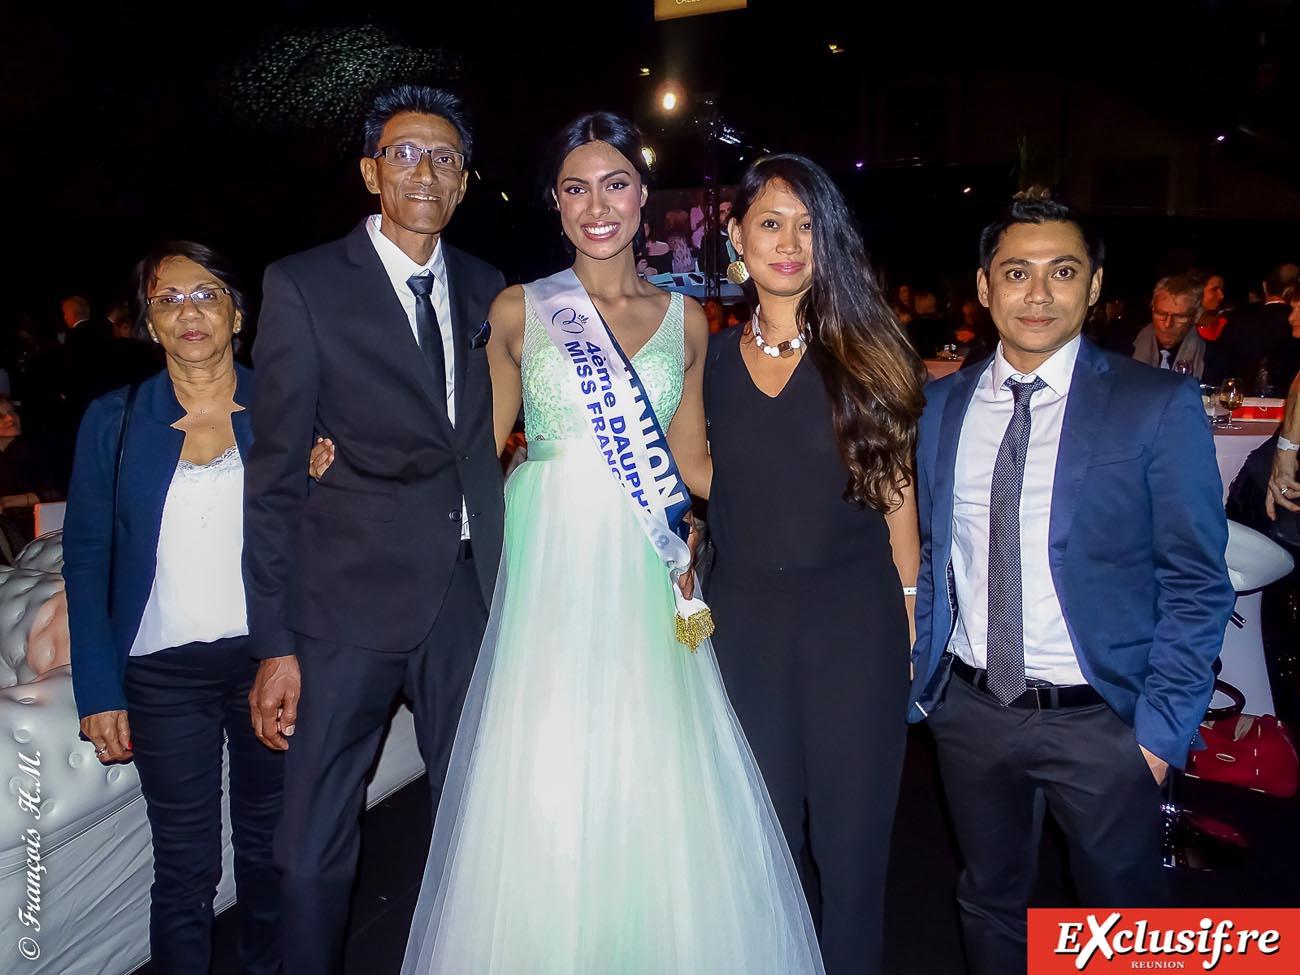 Audrey avec sa famille: sa tante Ginette Chan Pang Fong, son père Christian, sa cousine Françoise Chan Pang Fong, et son cousin Eric Chan Pang Fong